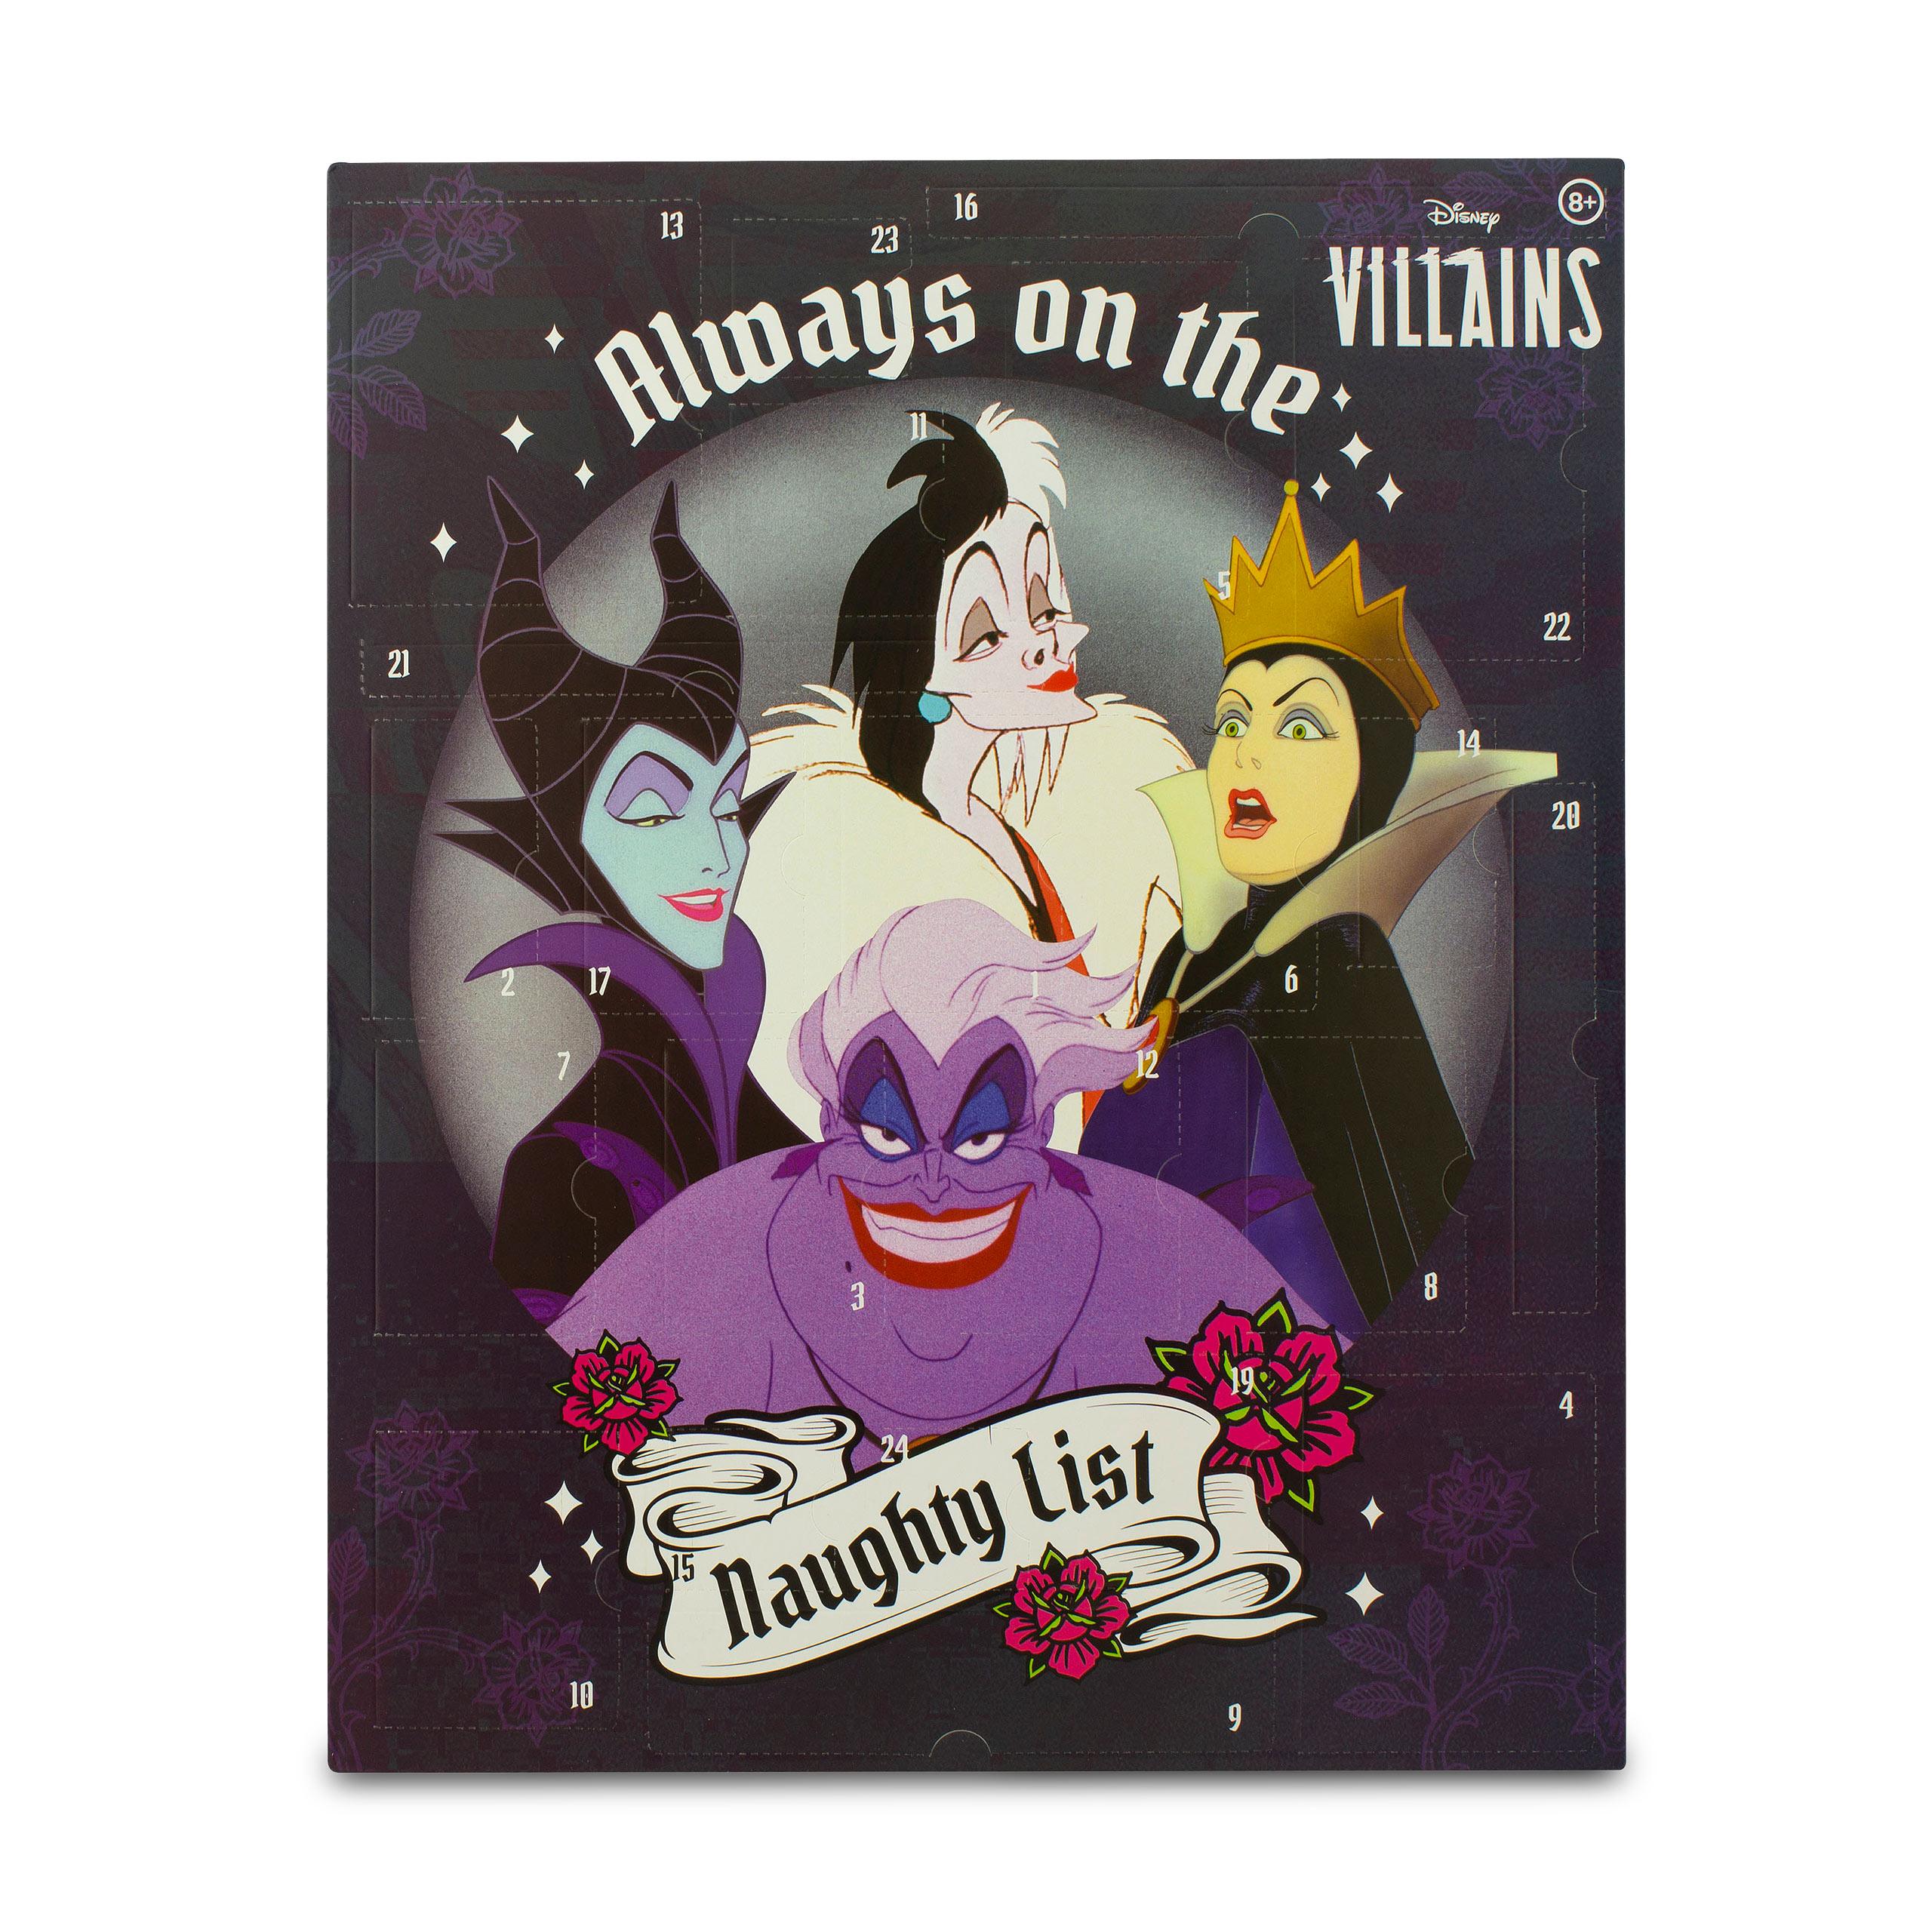 Disney Villains Adventskalender